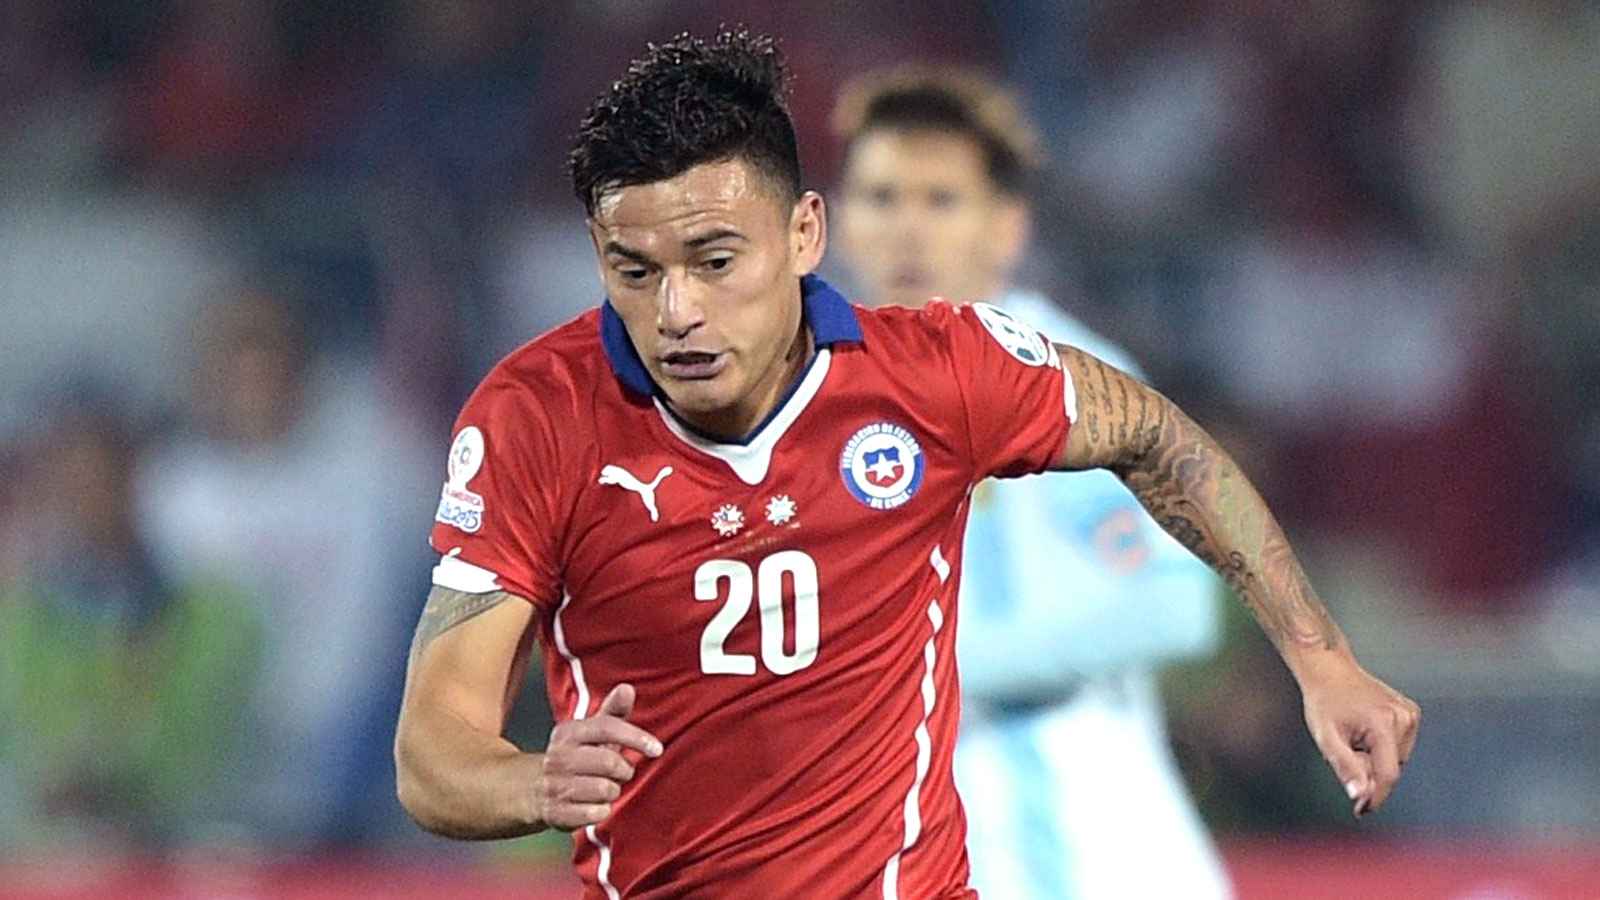 Bayer Leverkusen signs Chile midfielder Aranguiz from Internacional